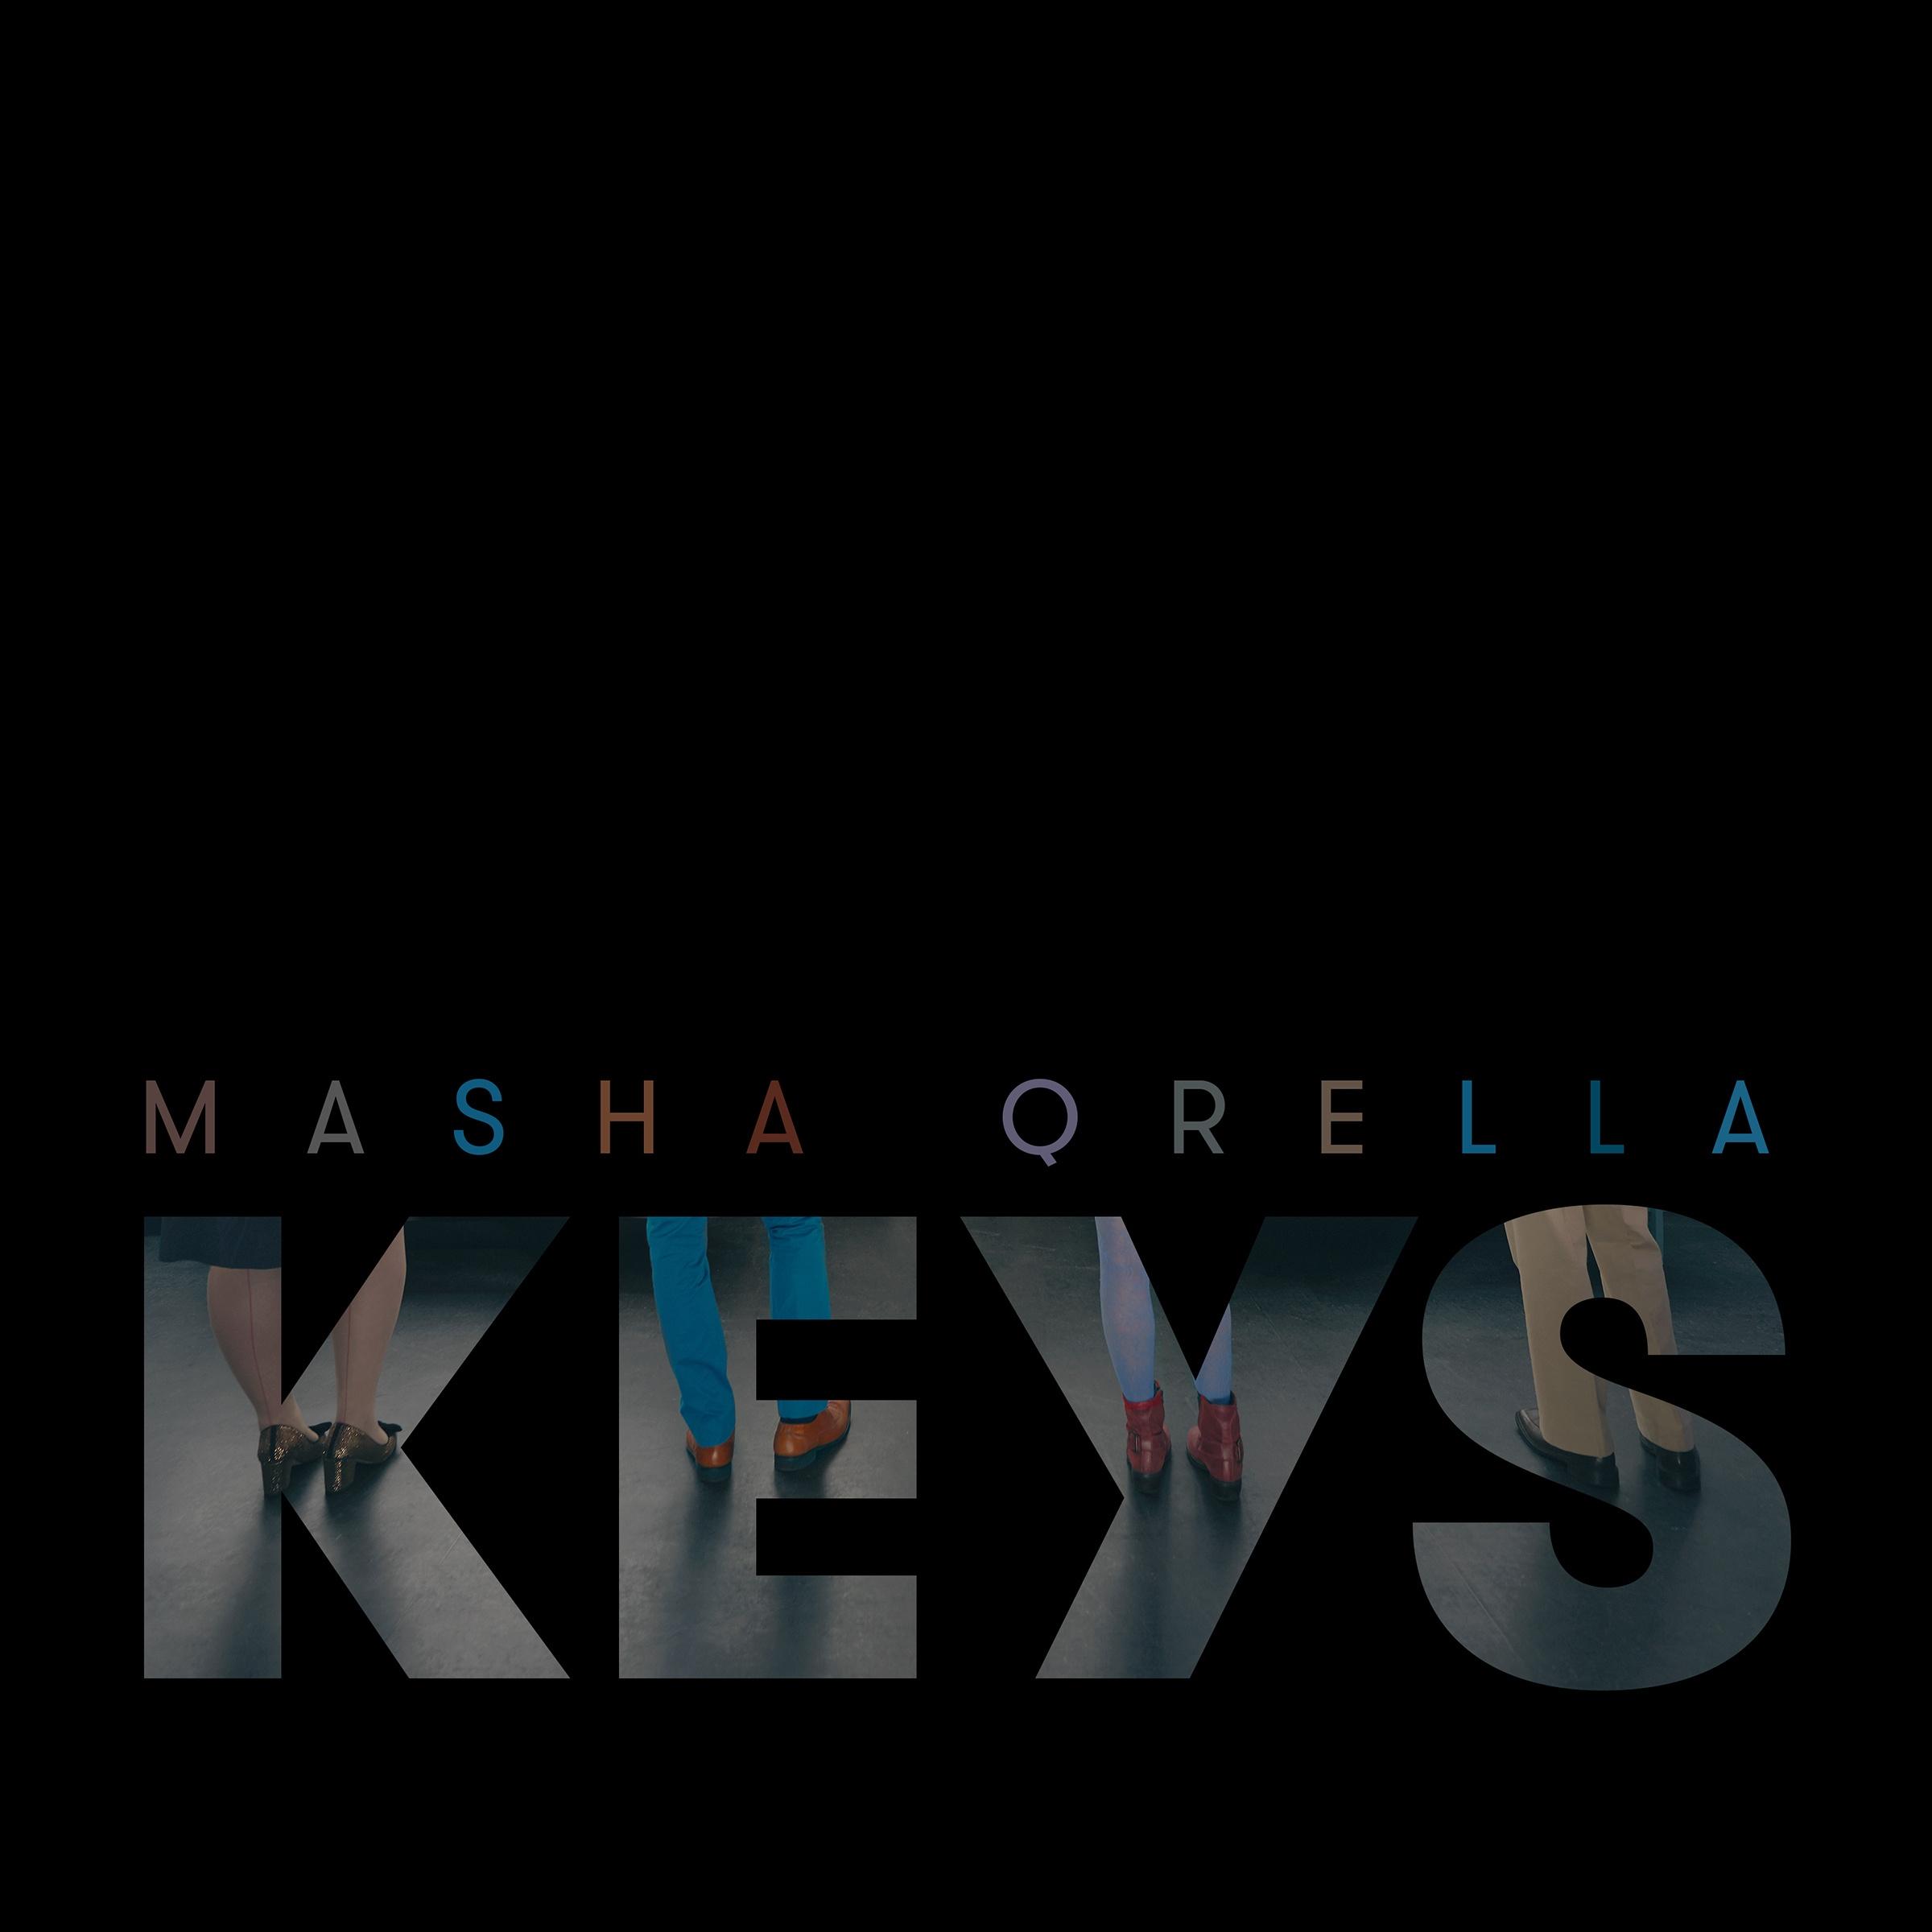 Masha Qrella